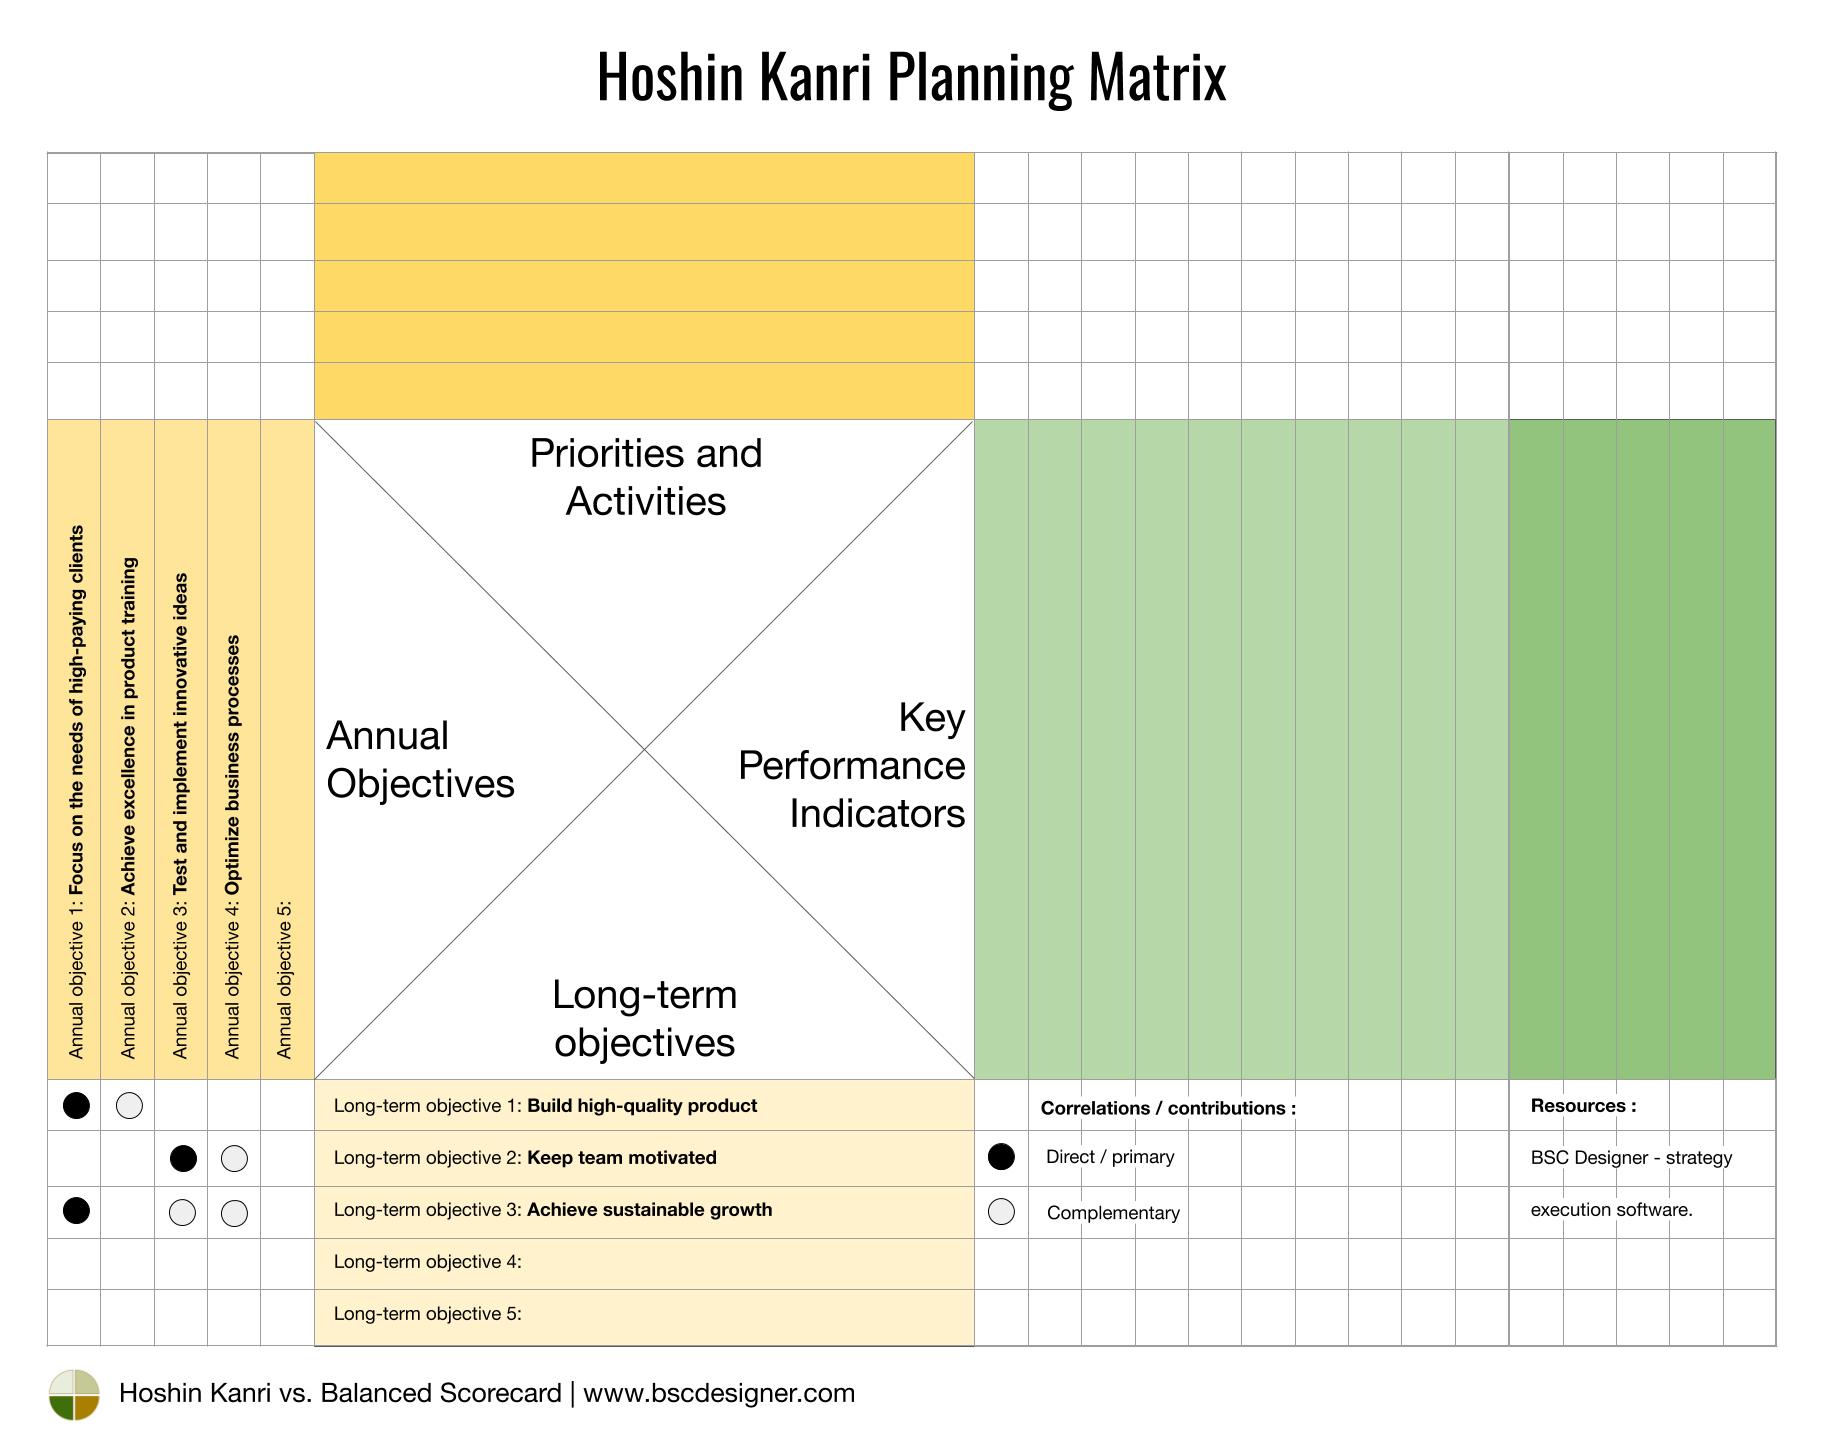 Hoshin Kanri - Annual Objectives